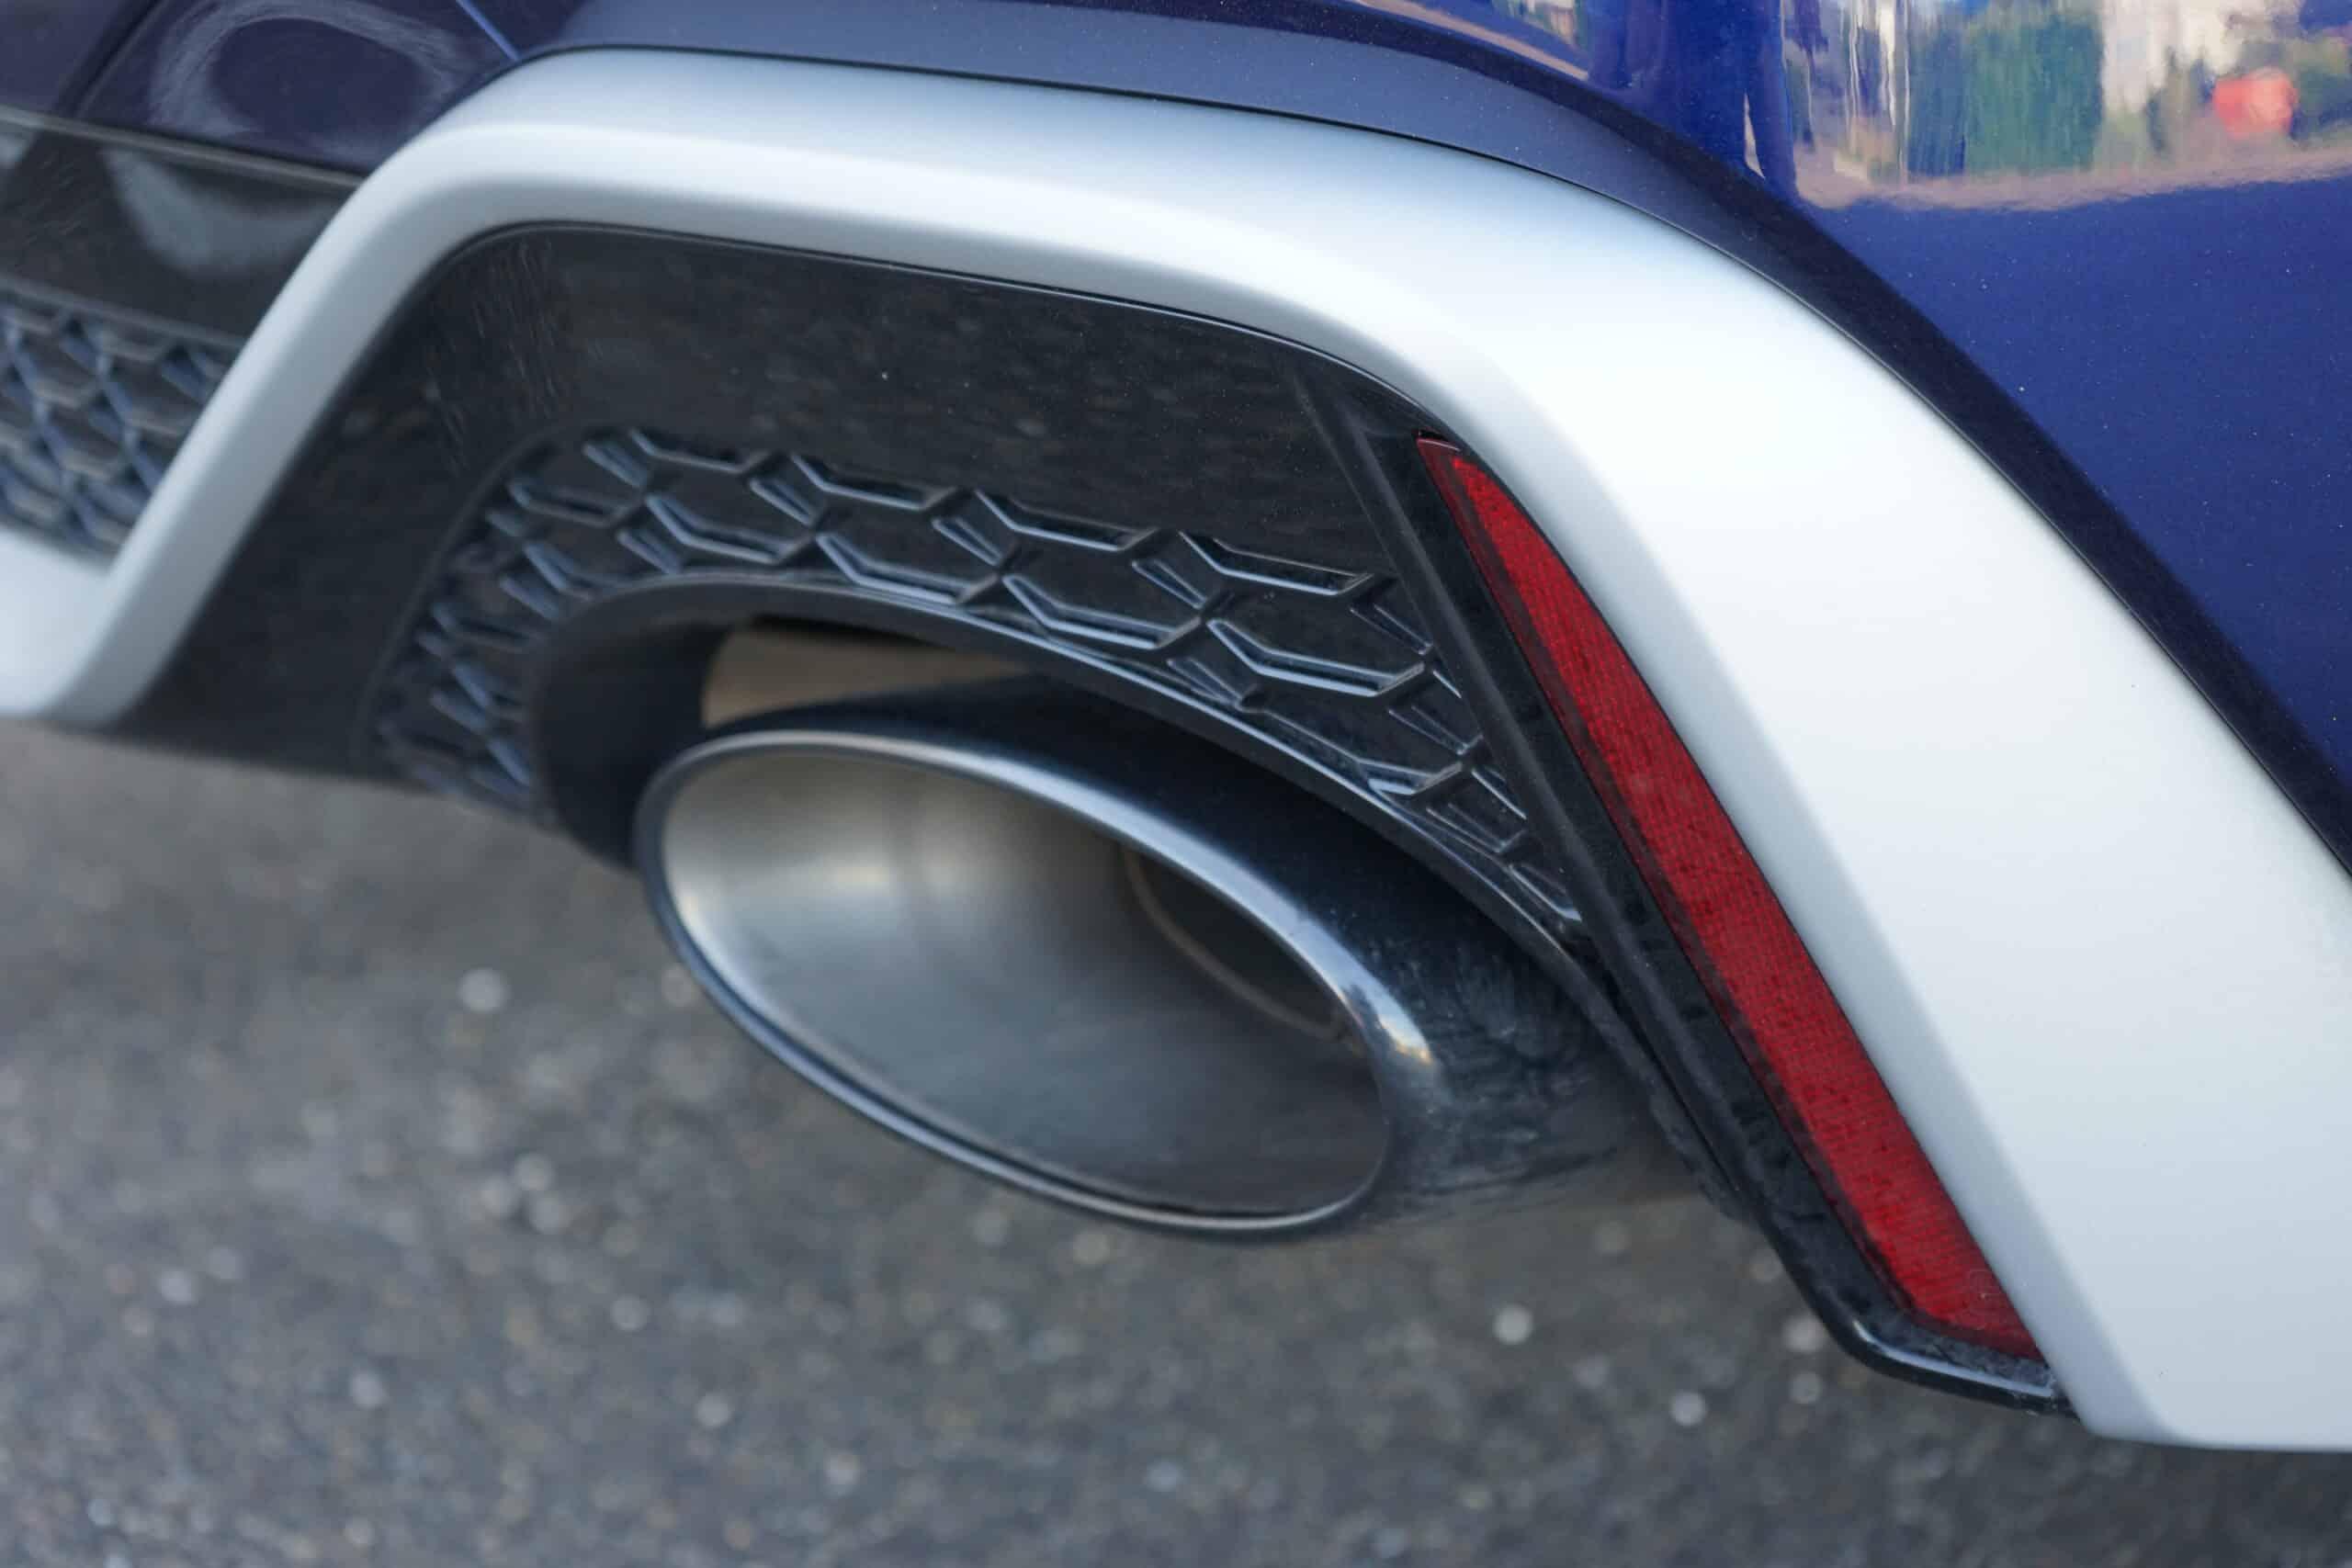 2020 Audi RS 7 Sportback (600 PS) - Hat er ihr Herz gebrochen? - POV I Sound I Autobahn